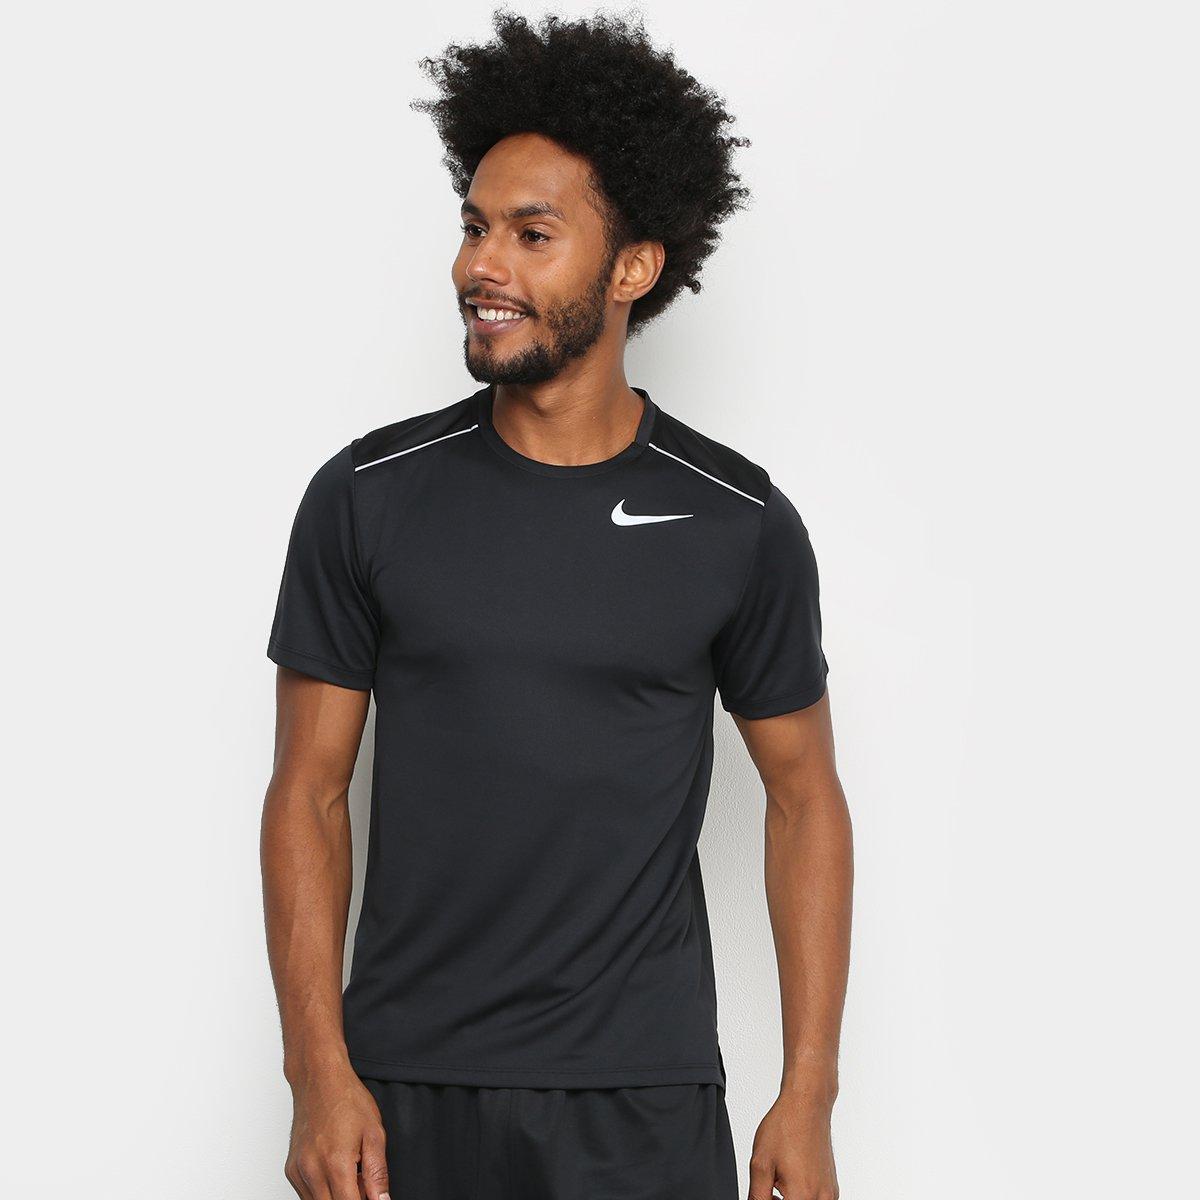 Camiseta Nike DRI-FIT Miler Masculina - Tam: P